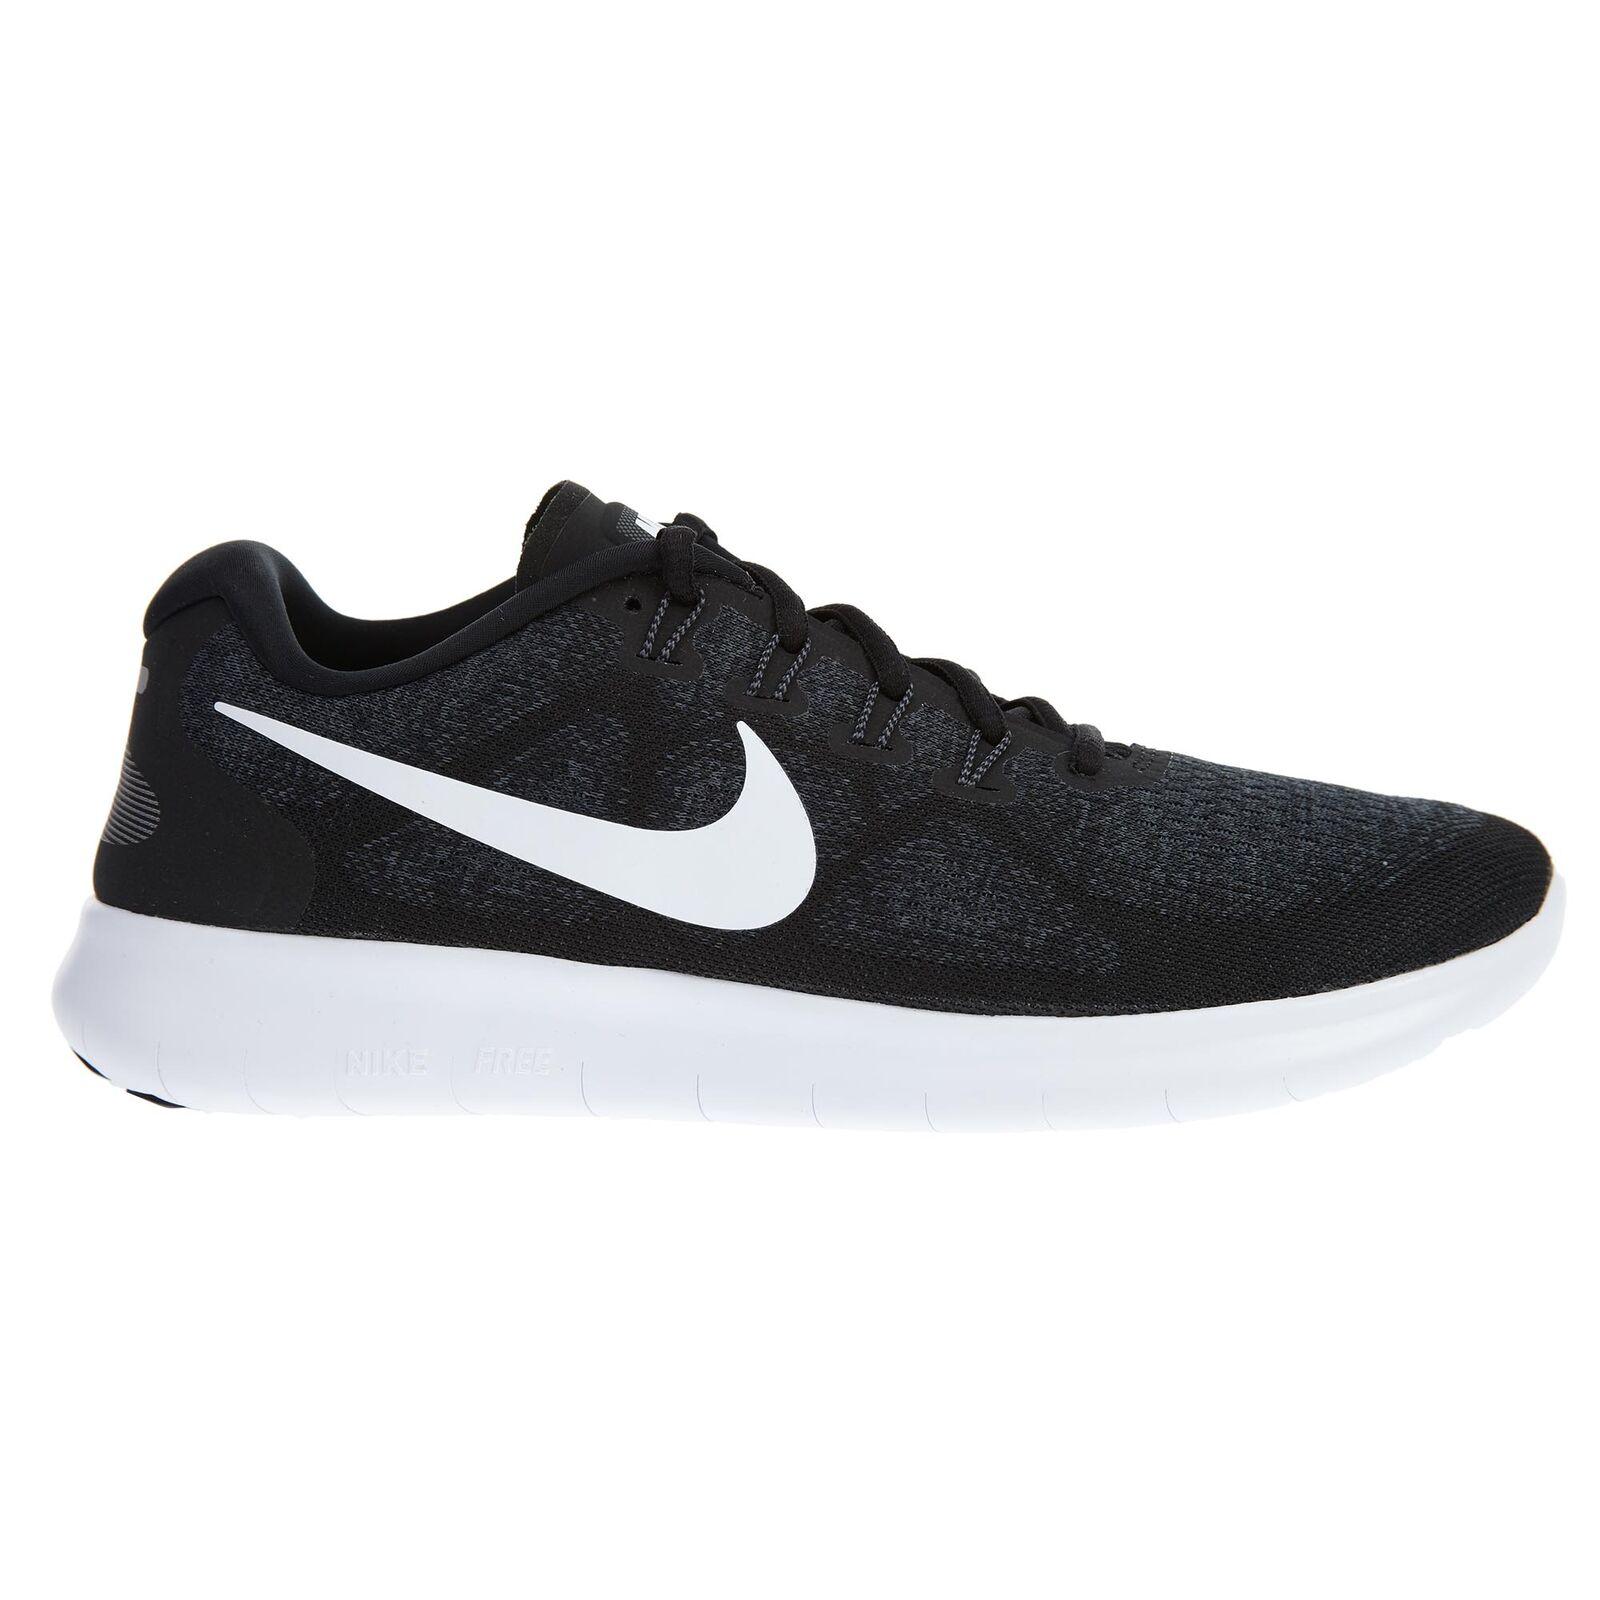 Nike Free RN 2017 Mens 880839-001 Black Grey Knit Mesh Running shoes Size 9